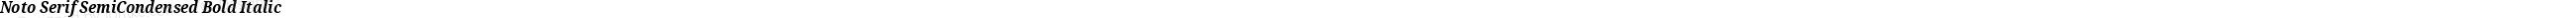 Noto Serif SemiCondensed Bold Italic